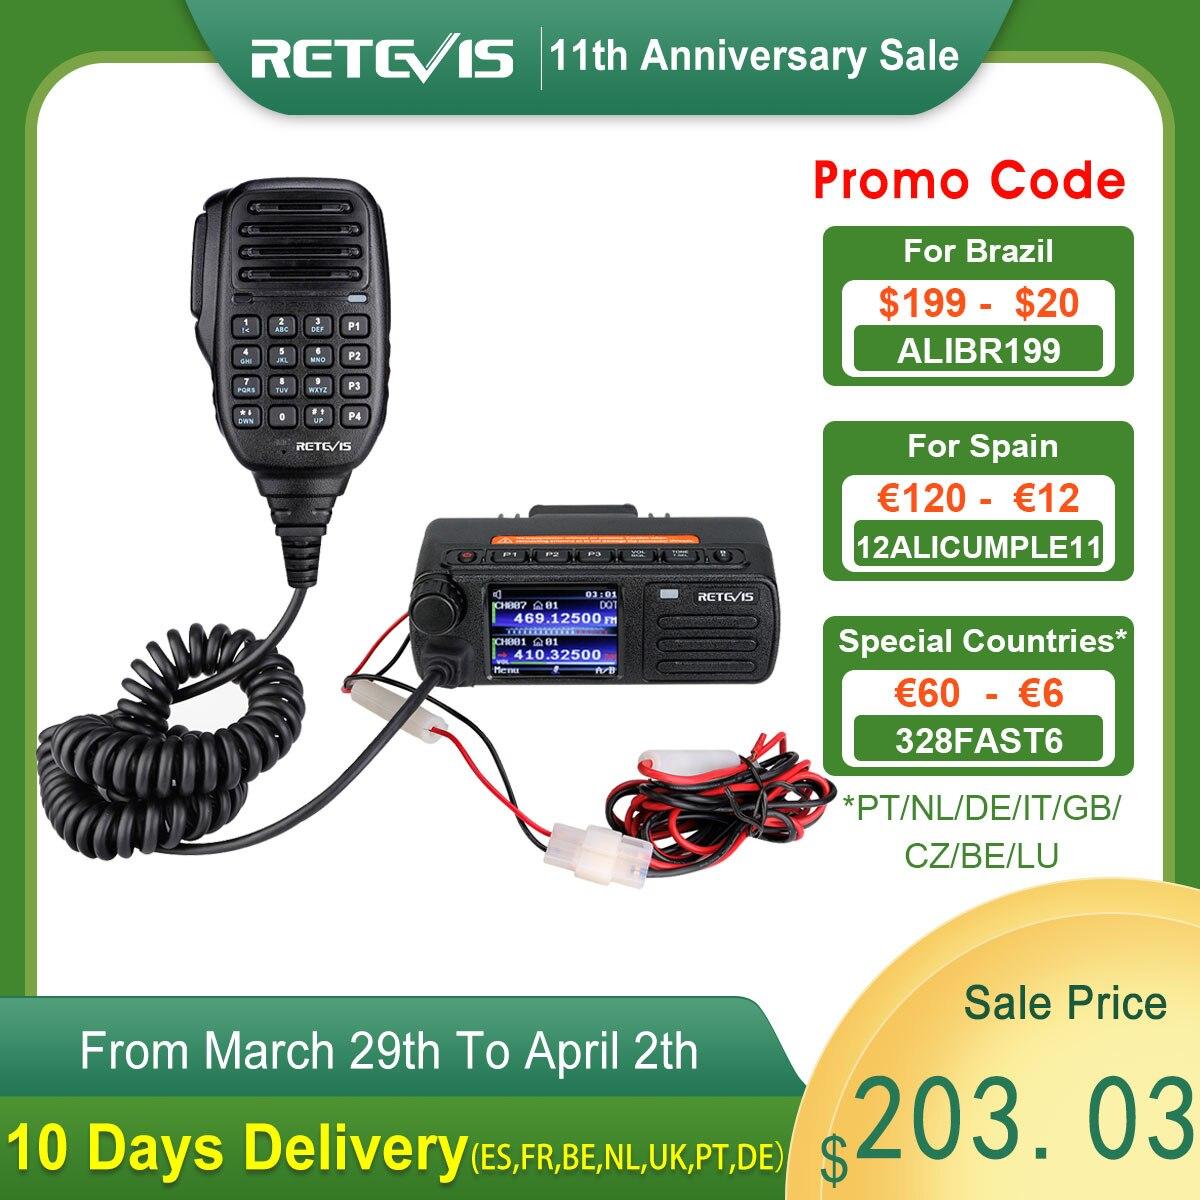 AliExpress - Hot Sale DMR Digital Mobile Radio Retevis RT73 Mini Digital Car Radio Station GPS UV Dual Band 20W with Hand Microphone +Cable